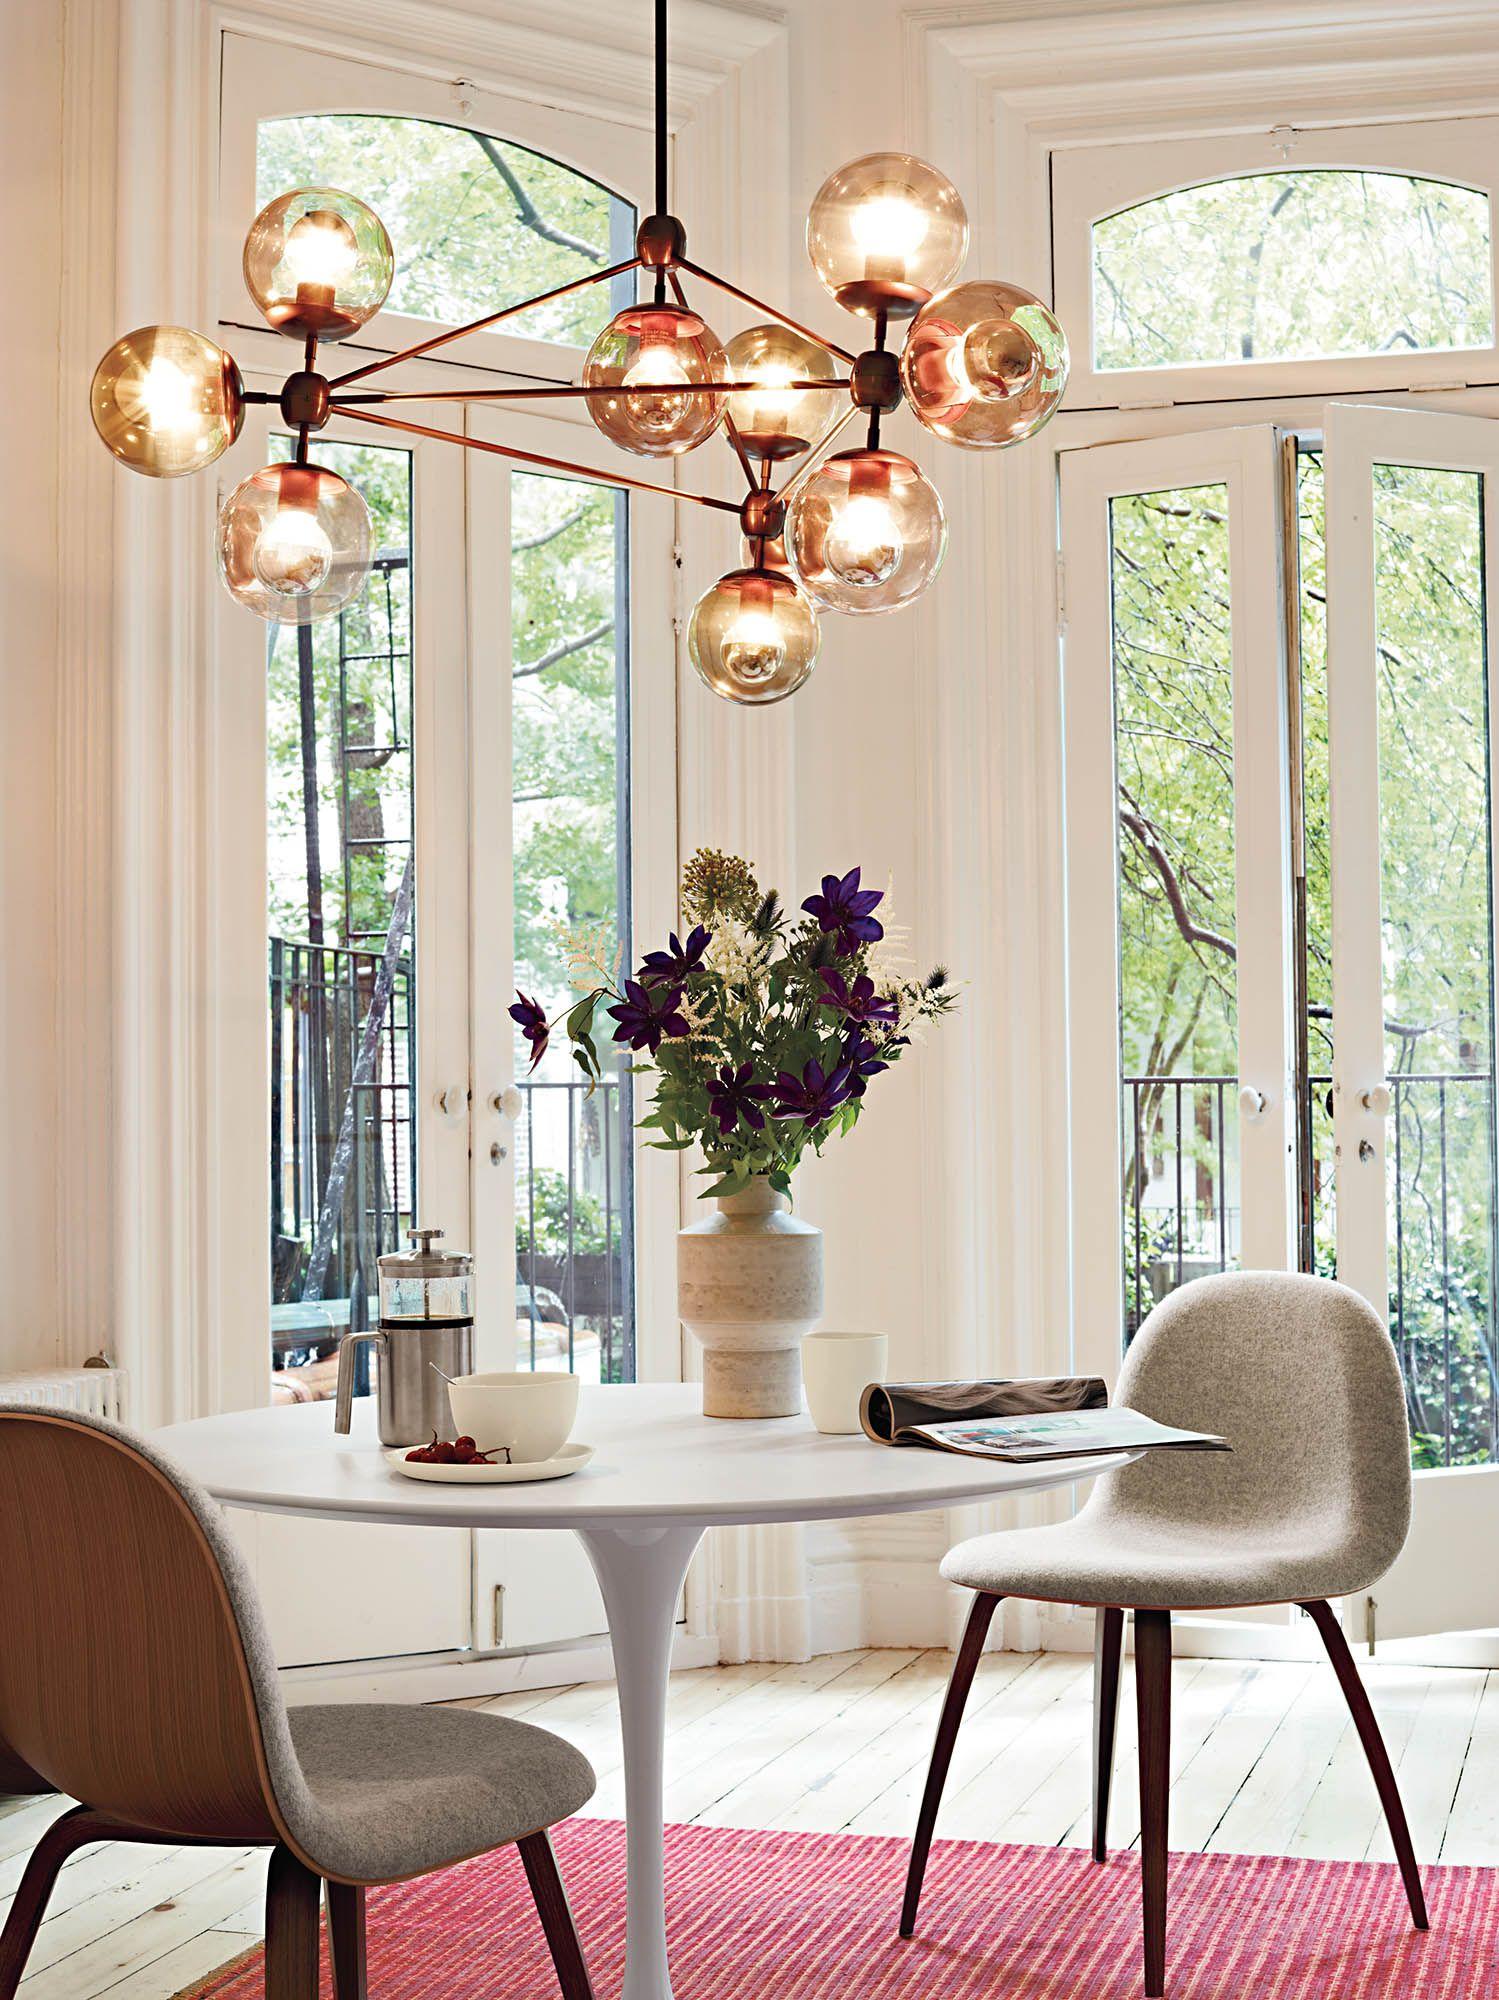 Saarinen Round Dining Table Designed By Eero